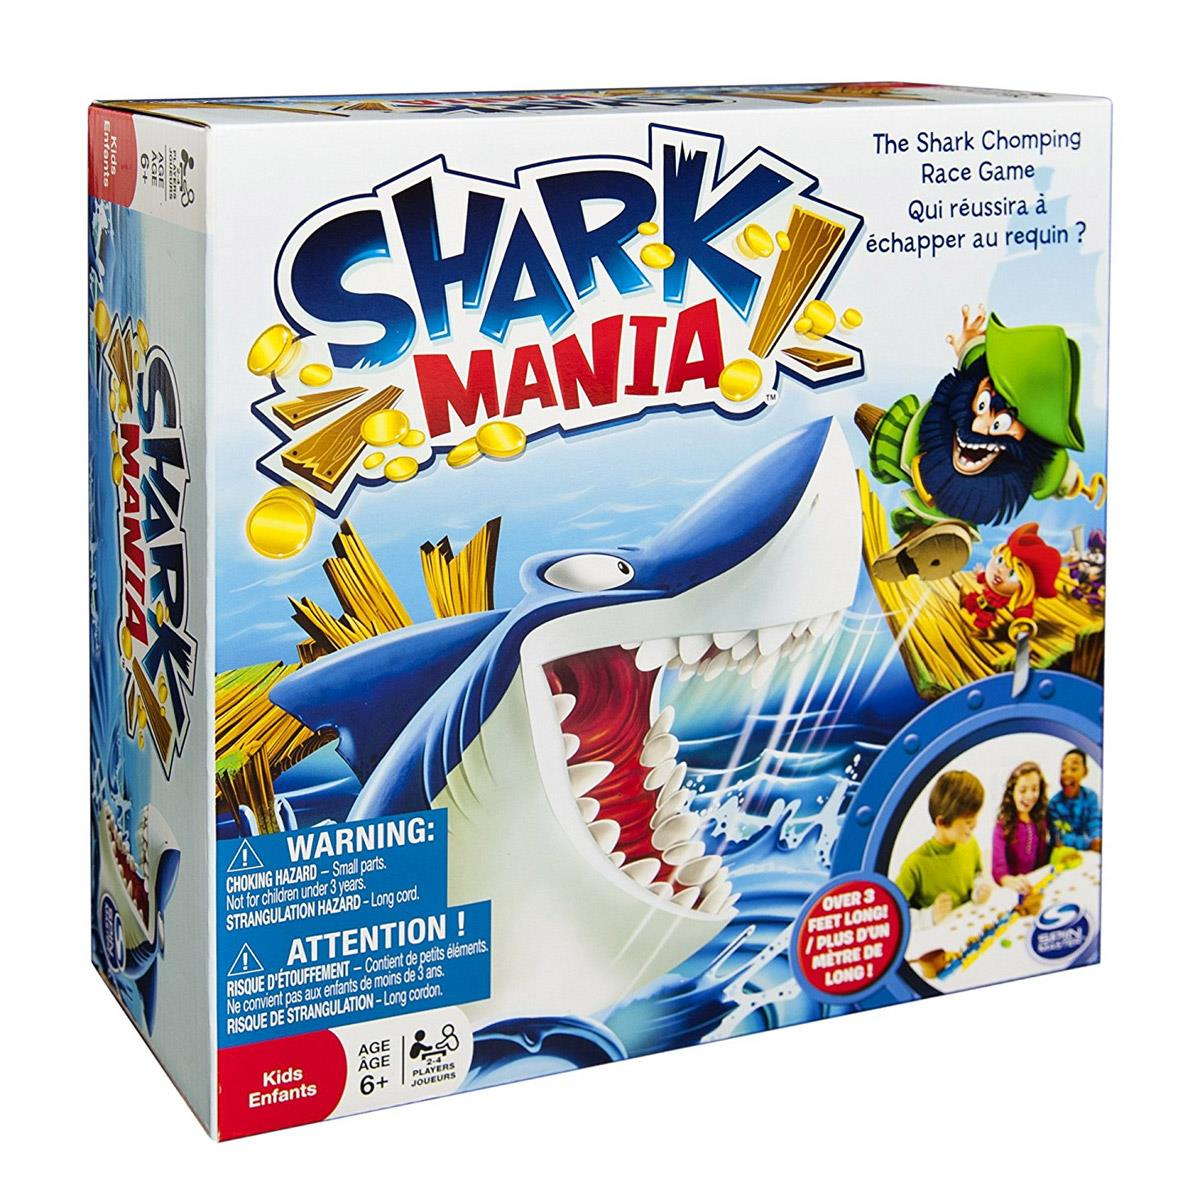 Shark Mania gra planszowa, Spin Master